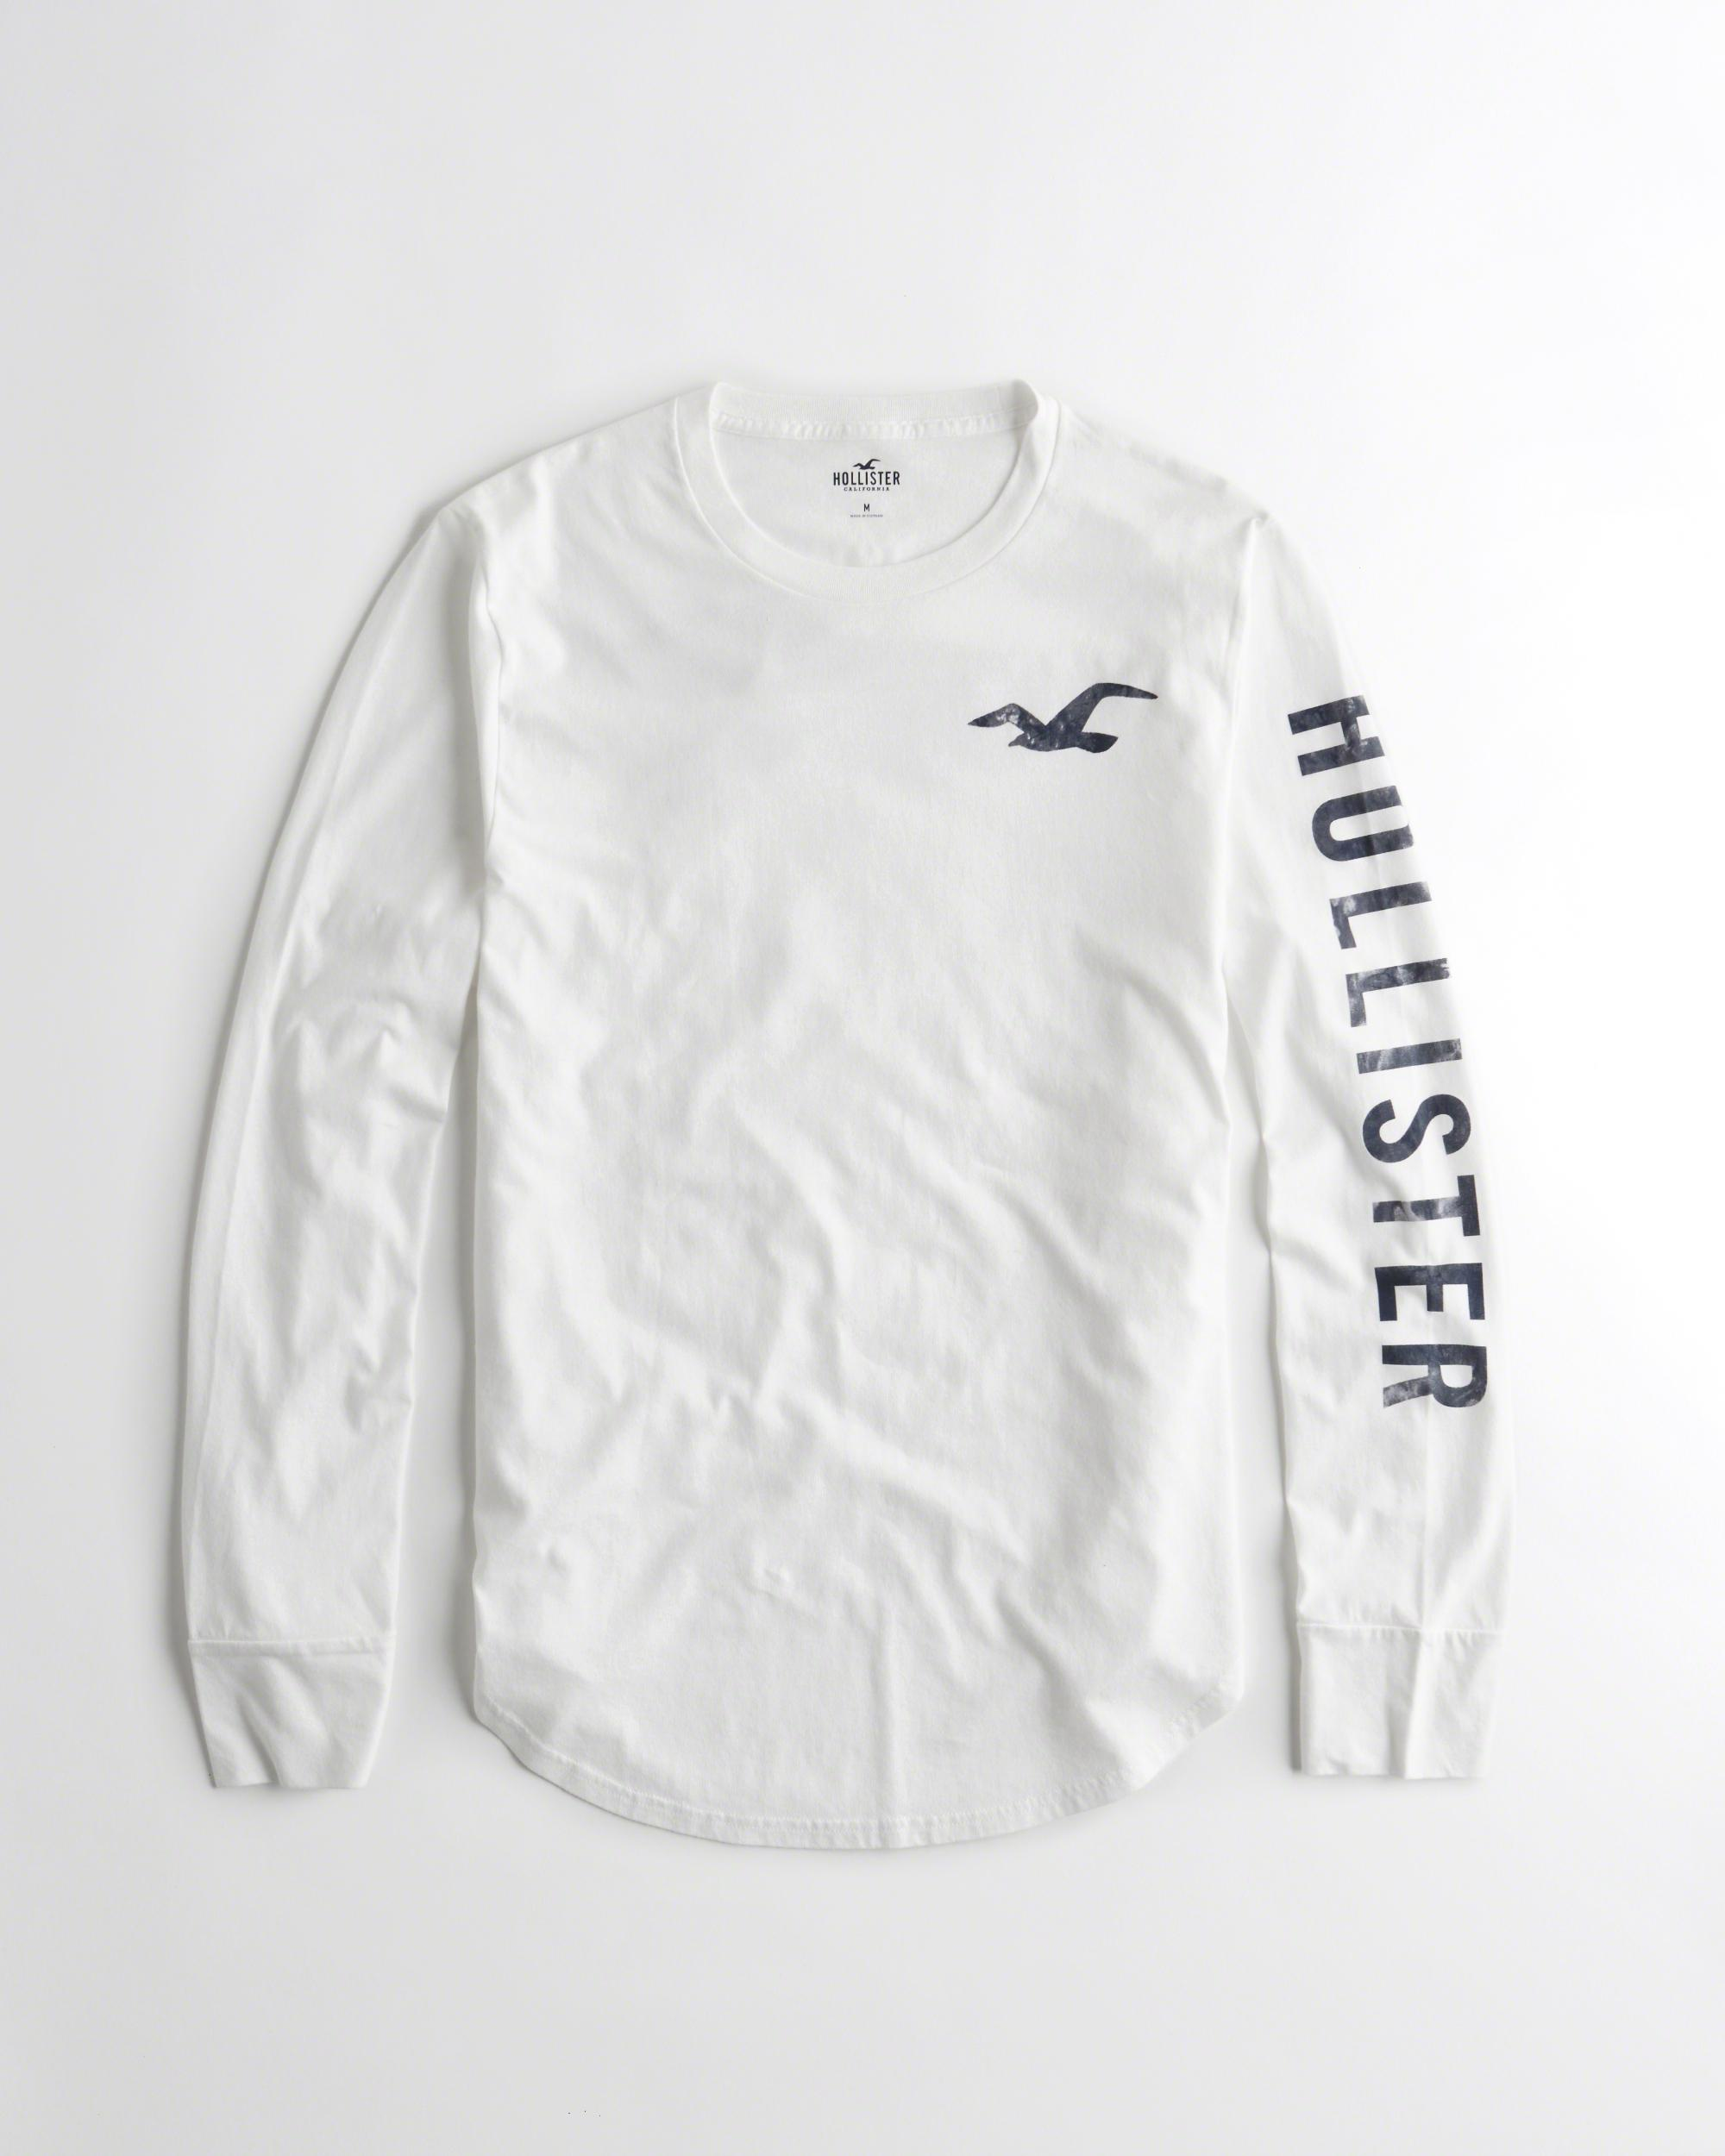 926ac1366fe0 Hollister Long Sleeve Shirts Mens